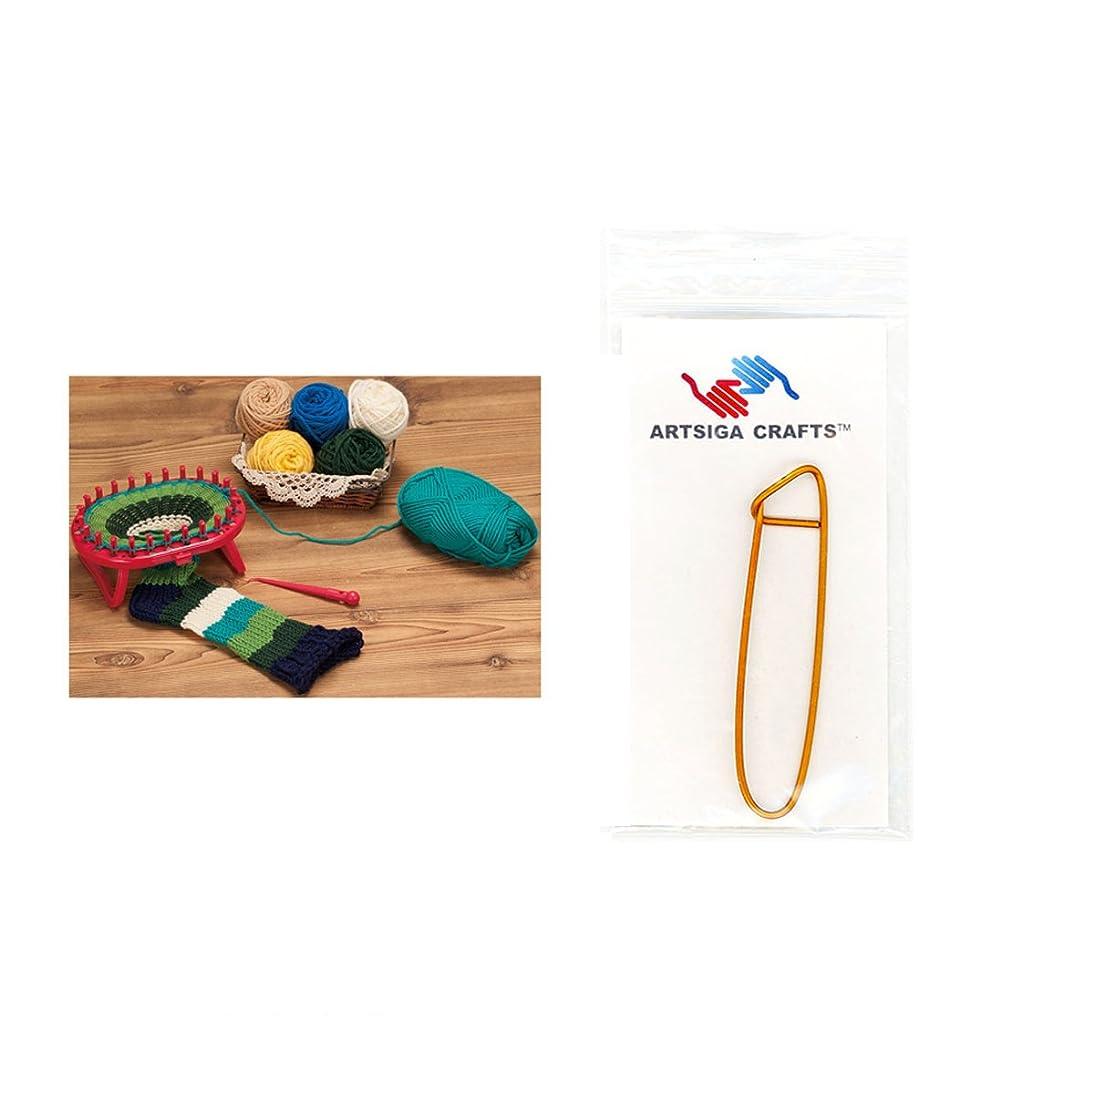 Clover Standing Oval Knitting Loom Bundle with 1 Artsiga Crafts Stitch Holder 3178